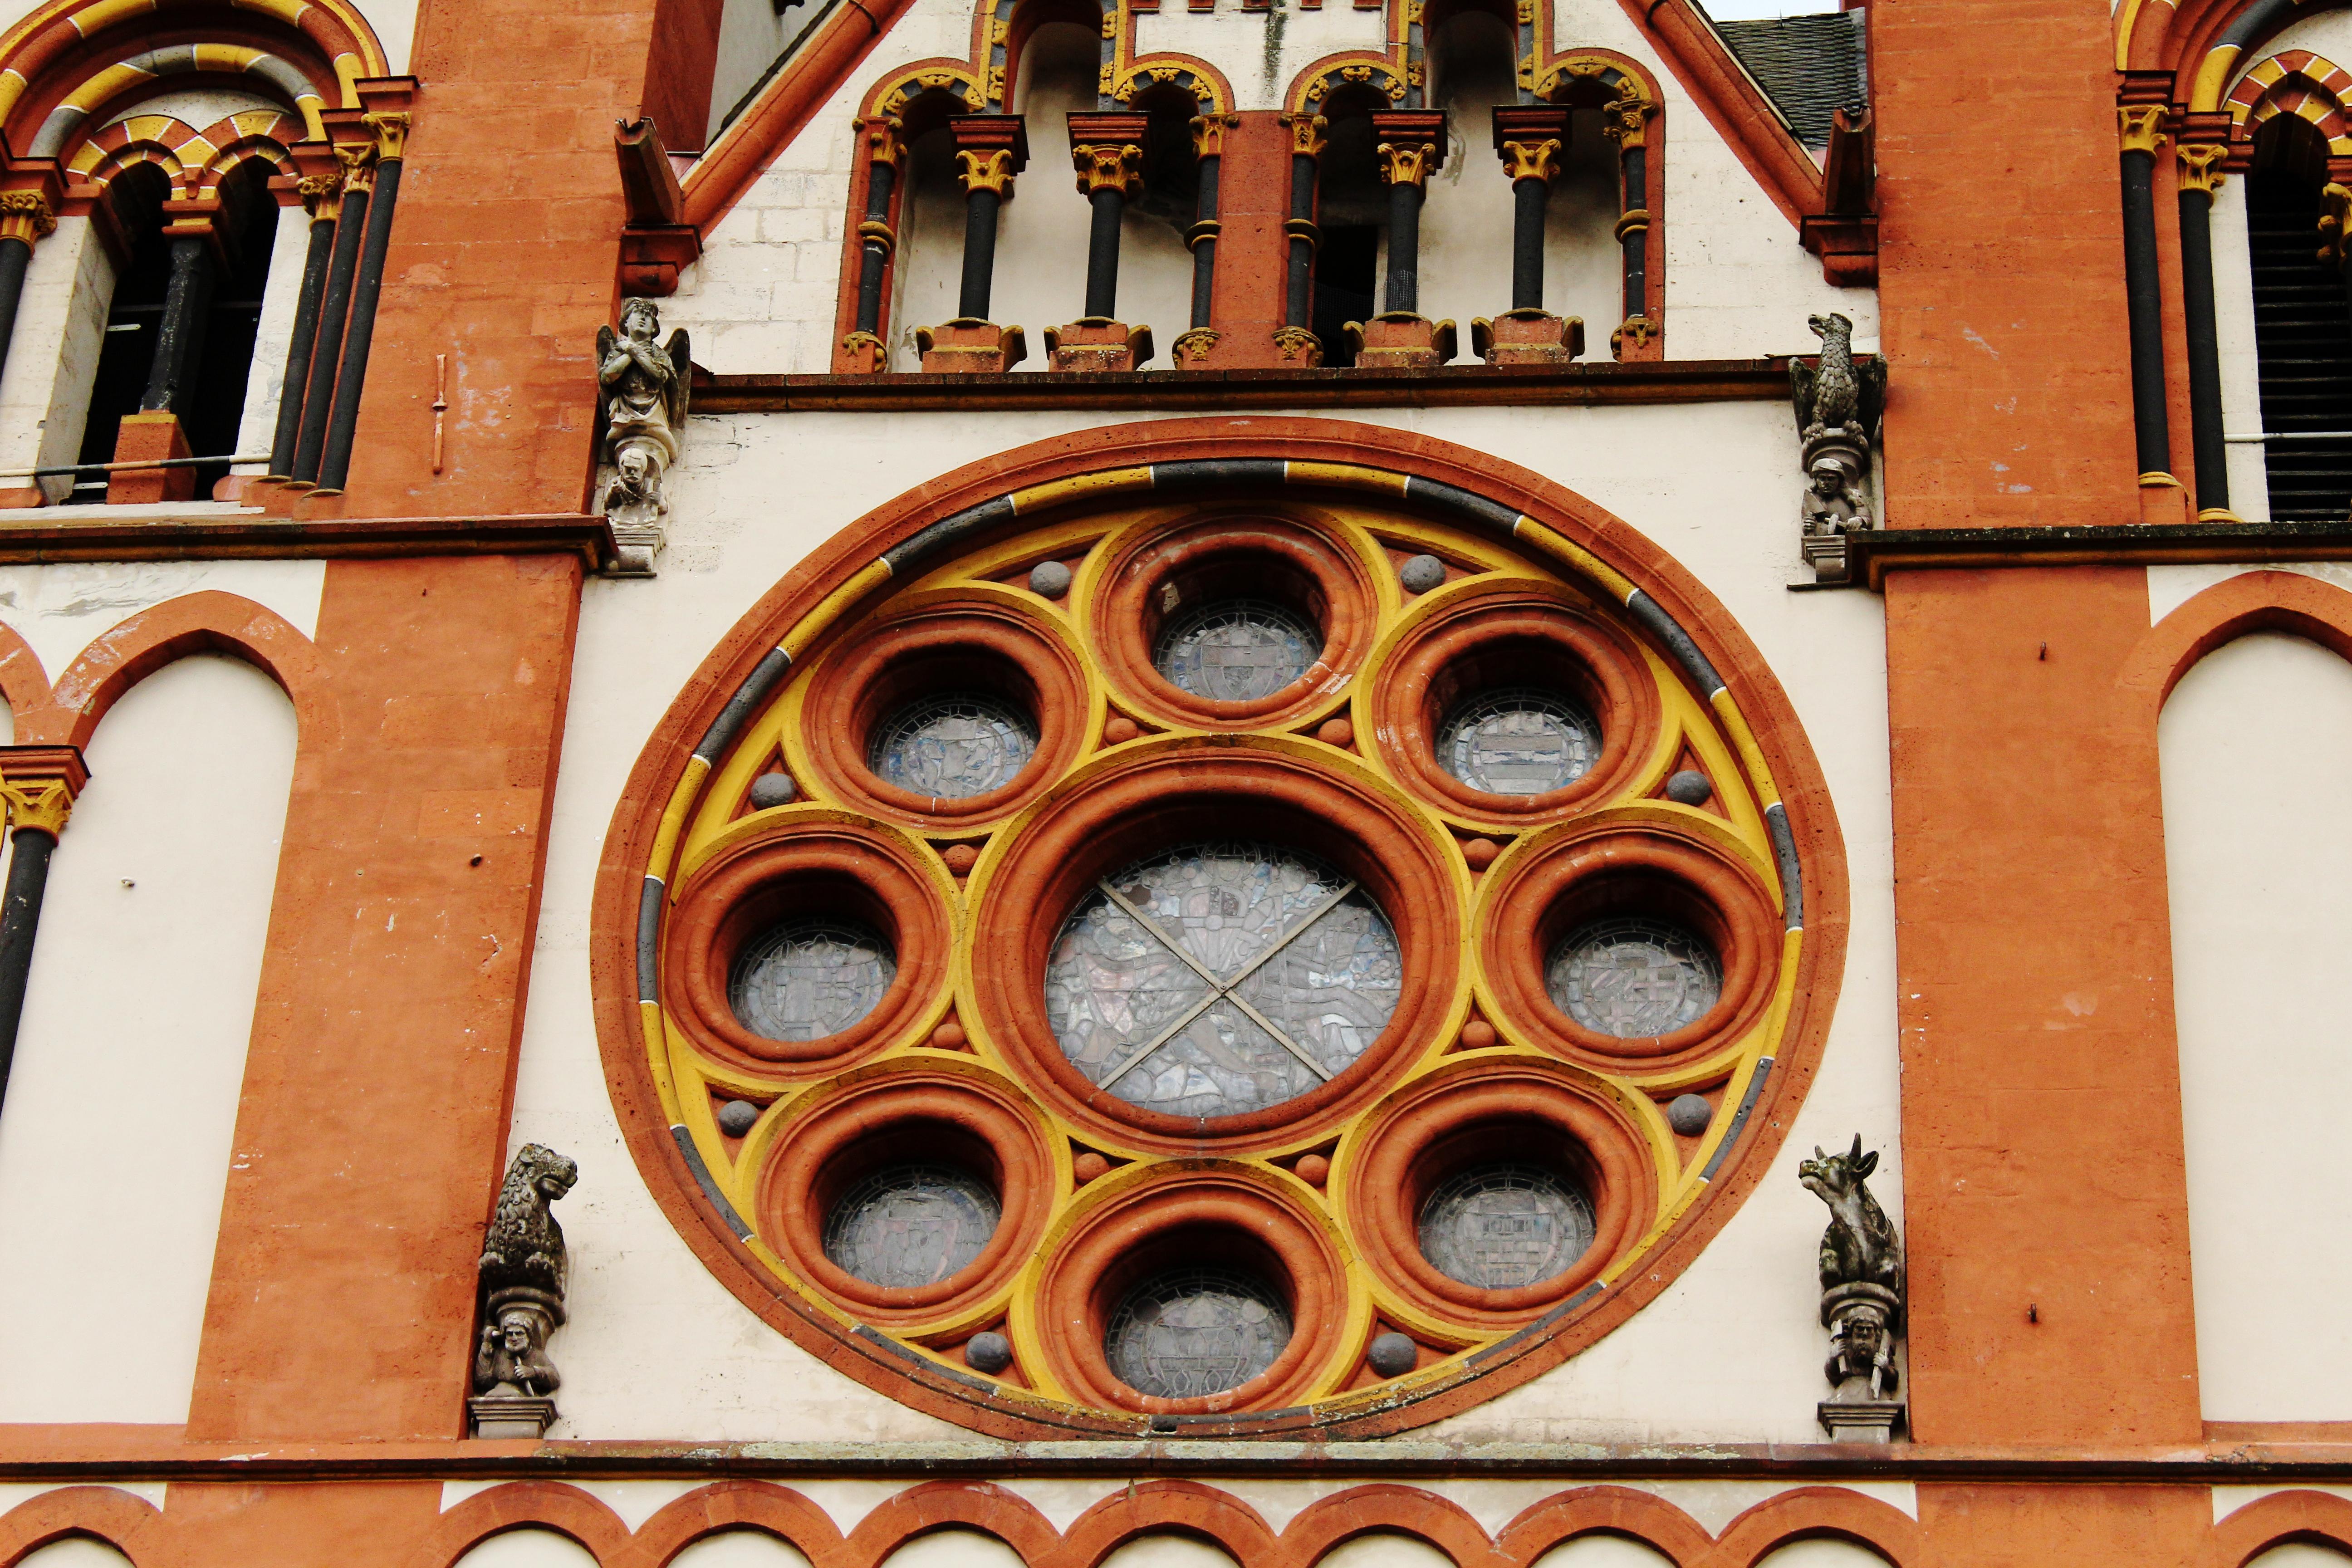 Dom St George in Limburg, Germany